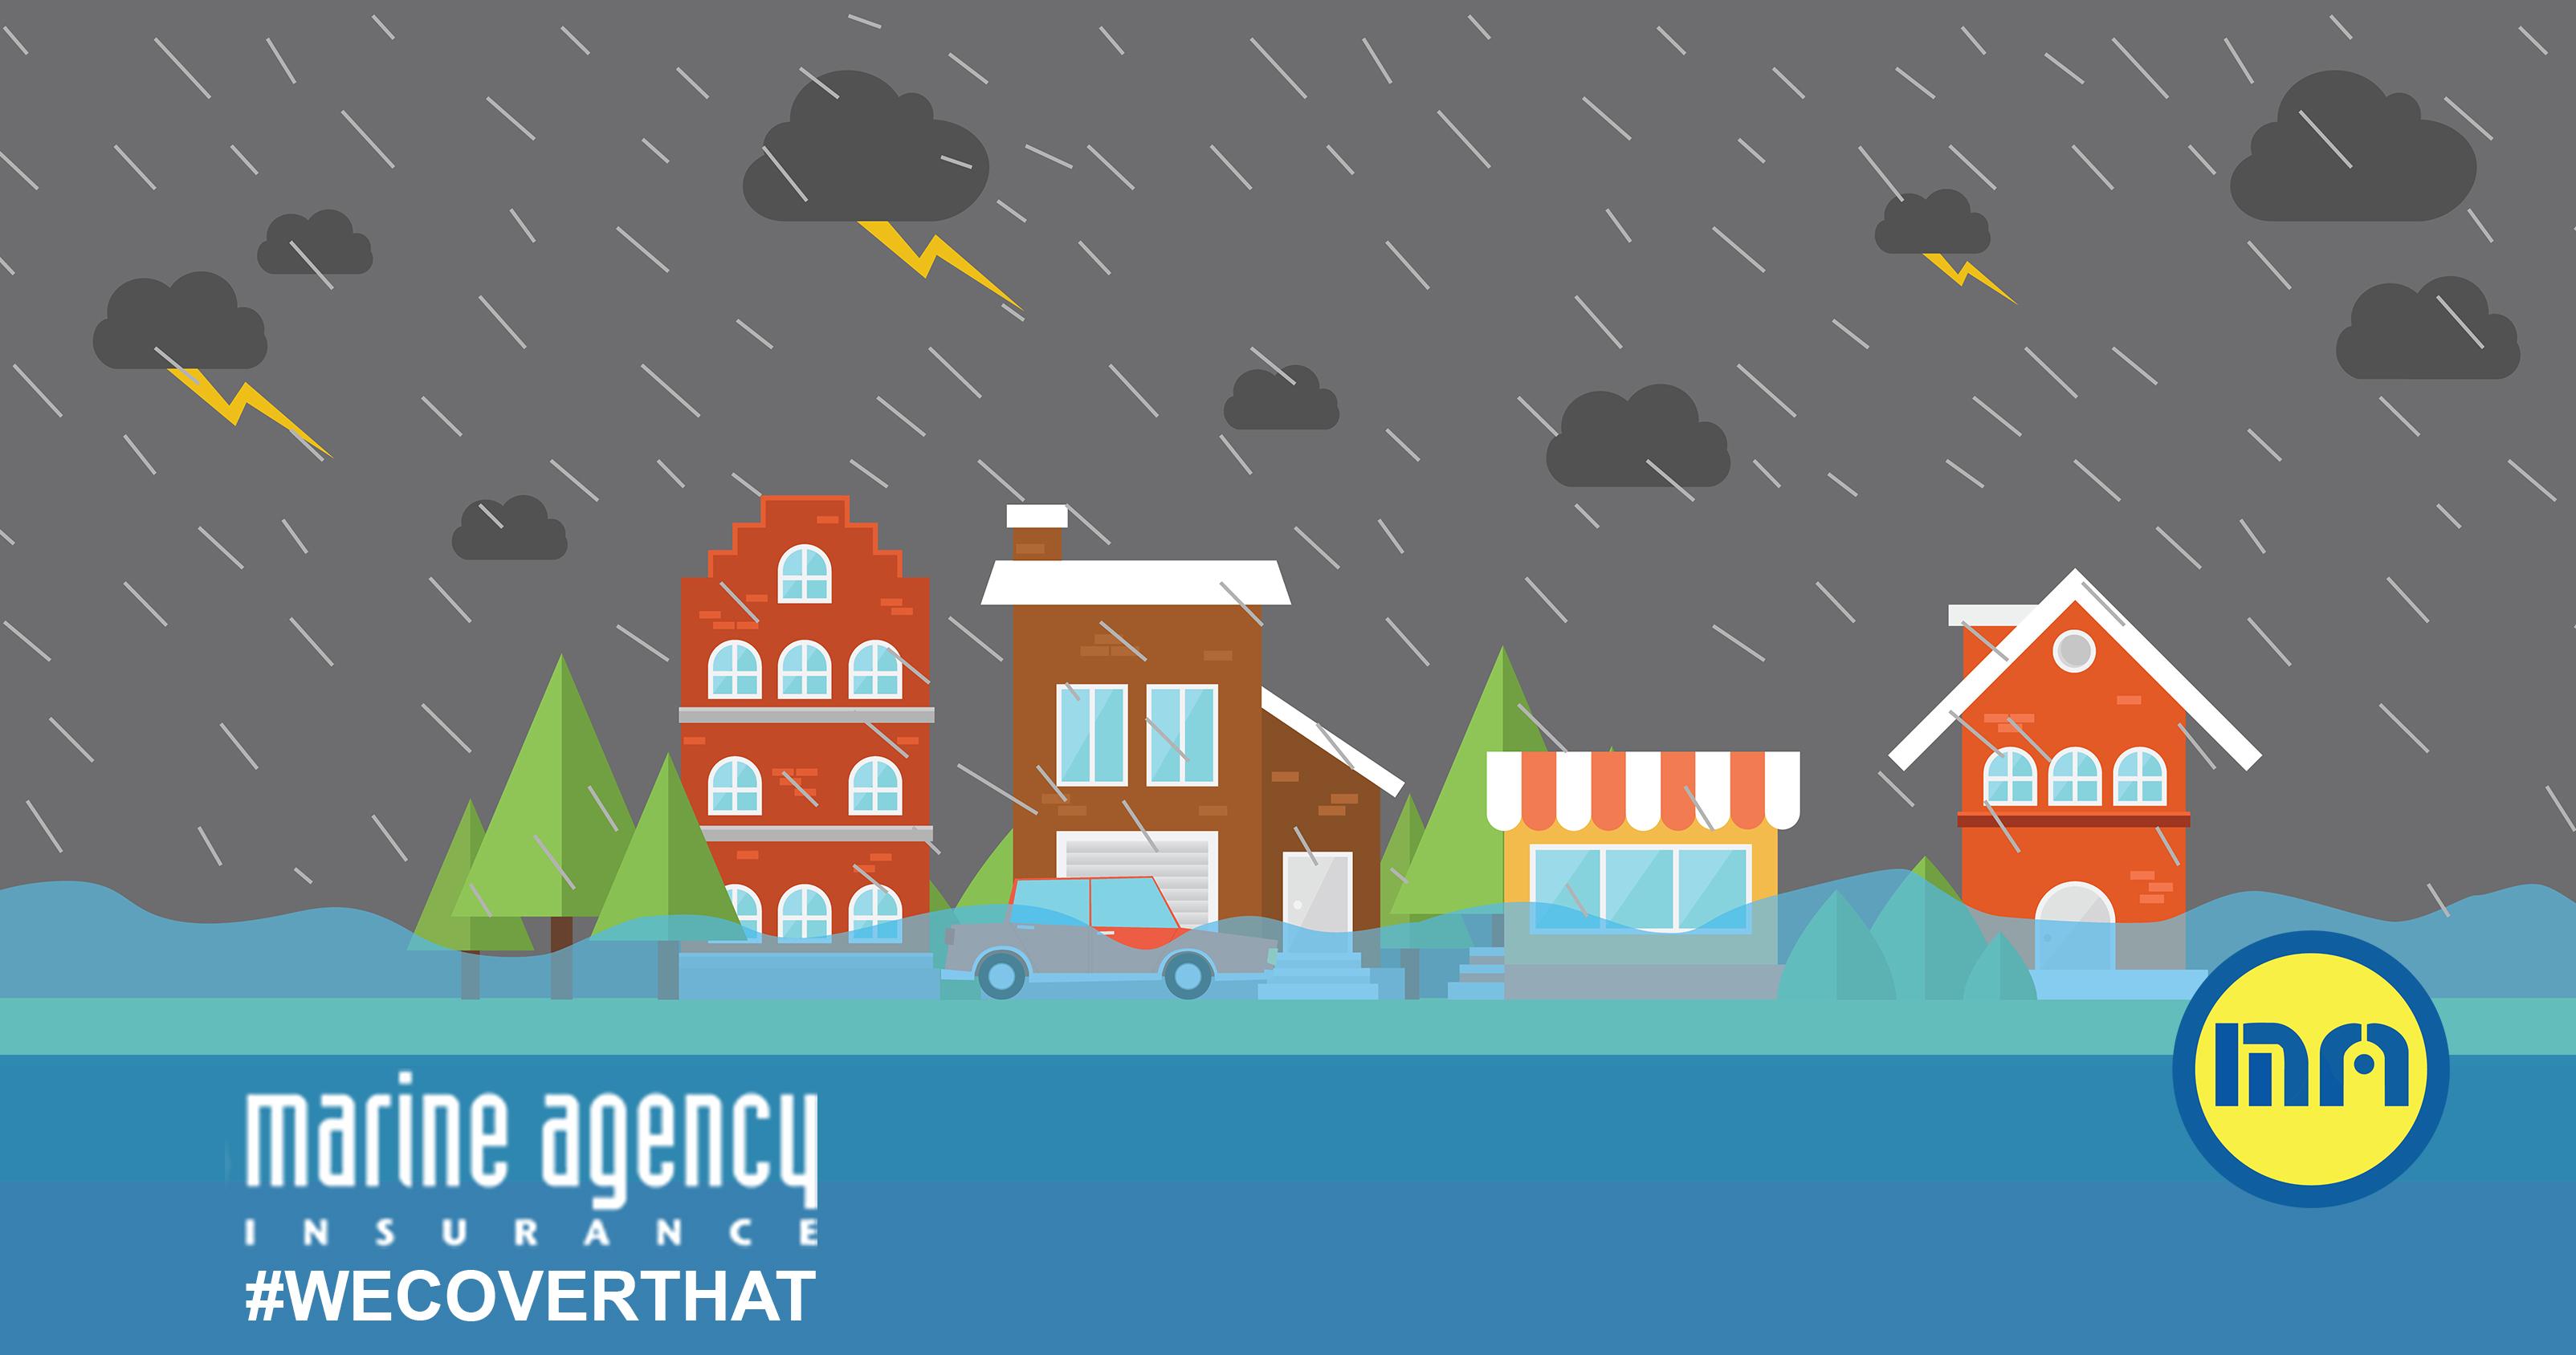 Hurricane business plan